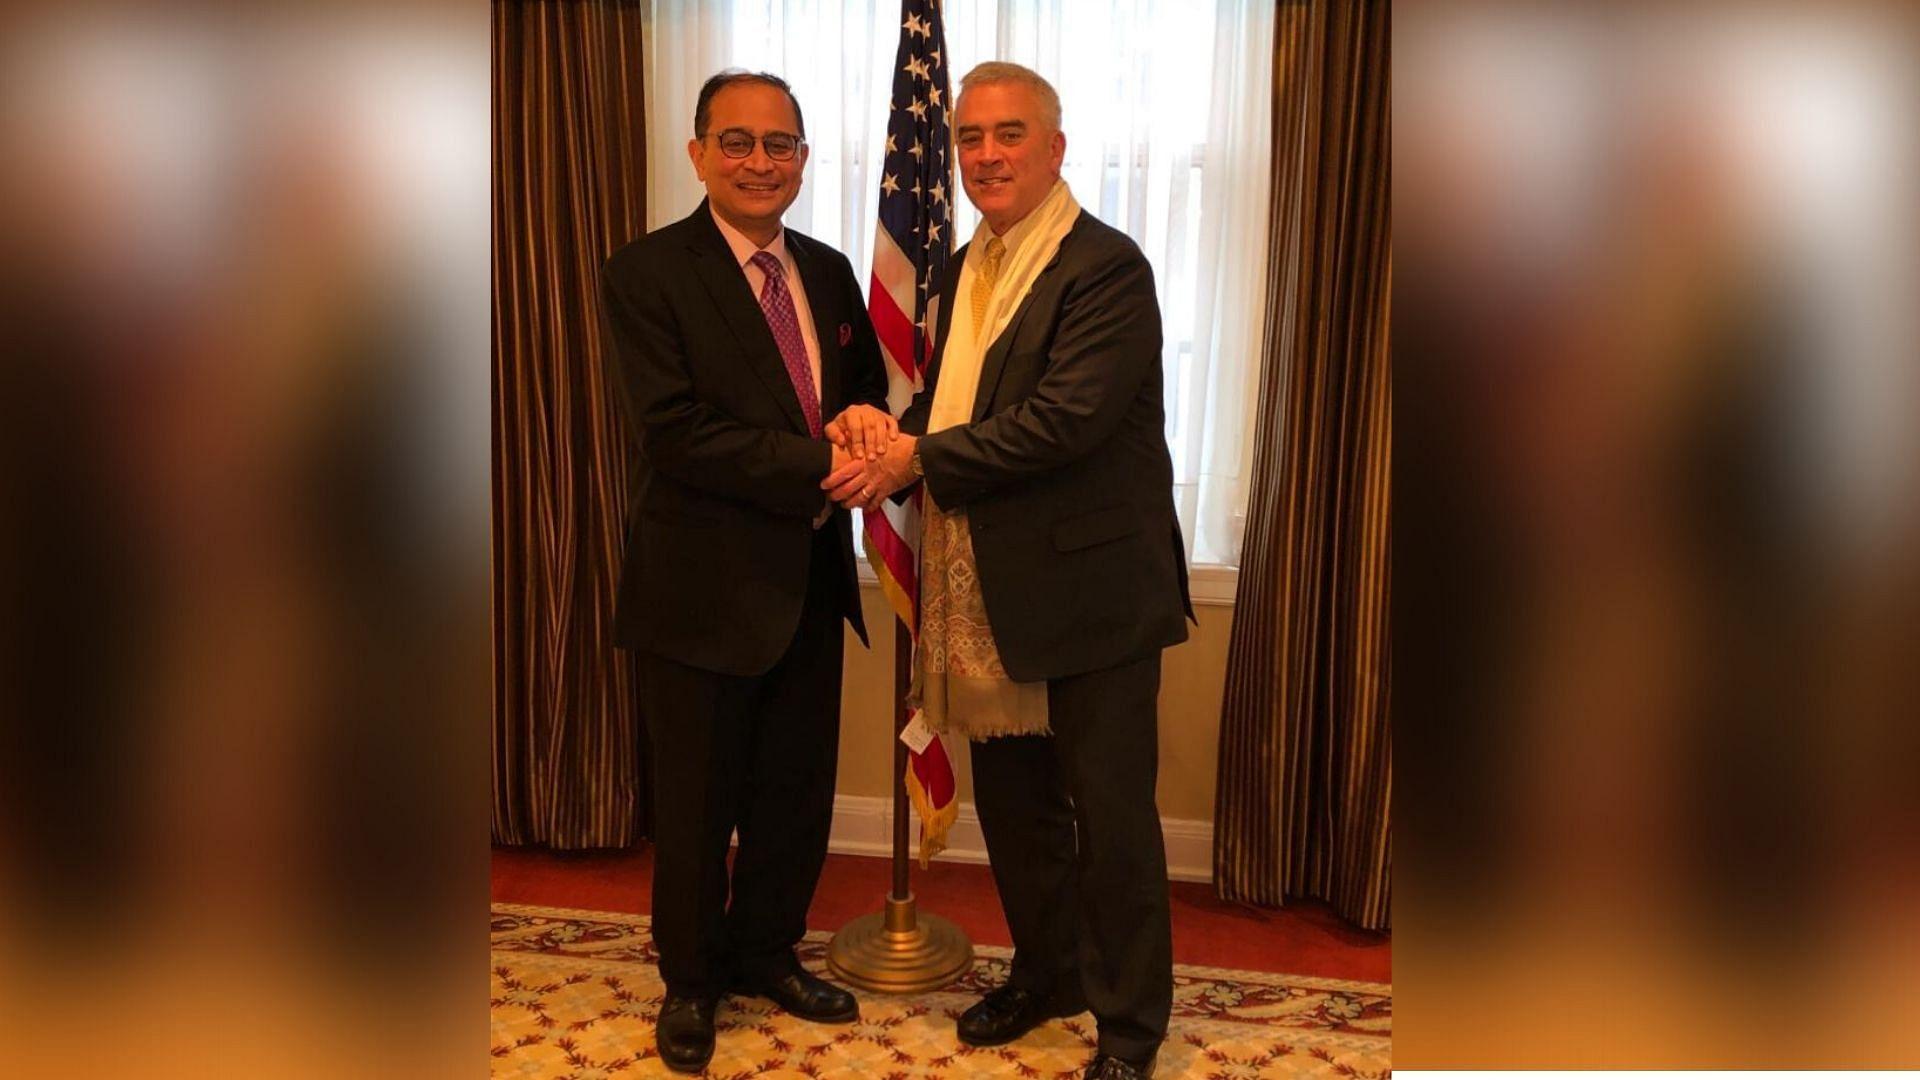 Indian Diplomat Endorses 'Israel-Like Model' for Kashmir